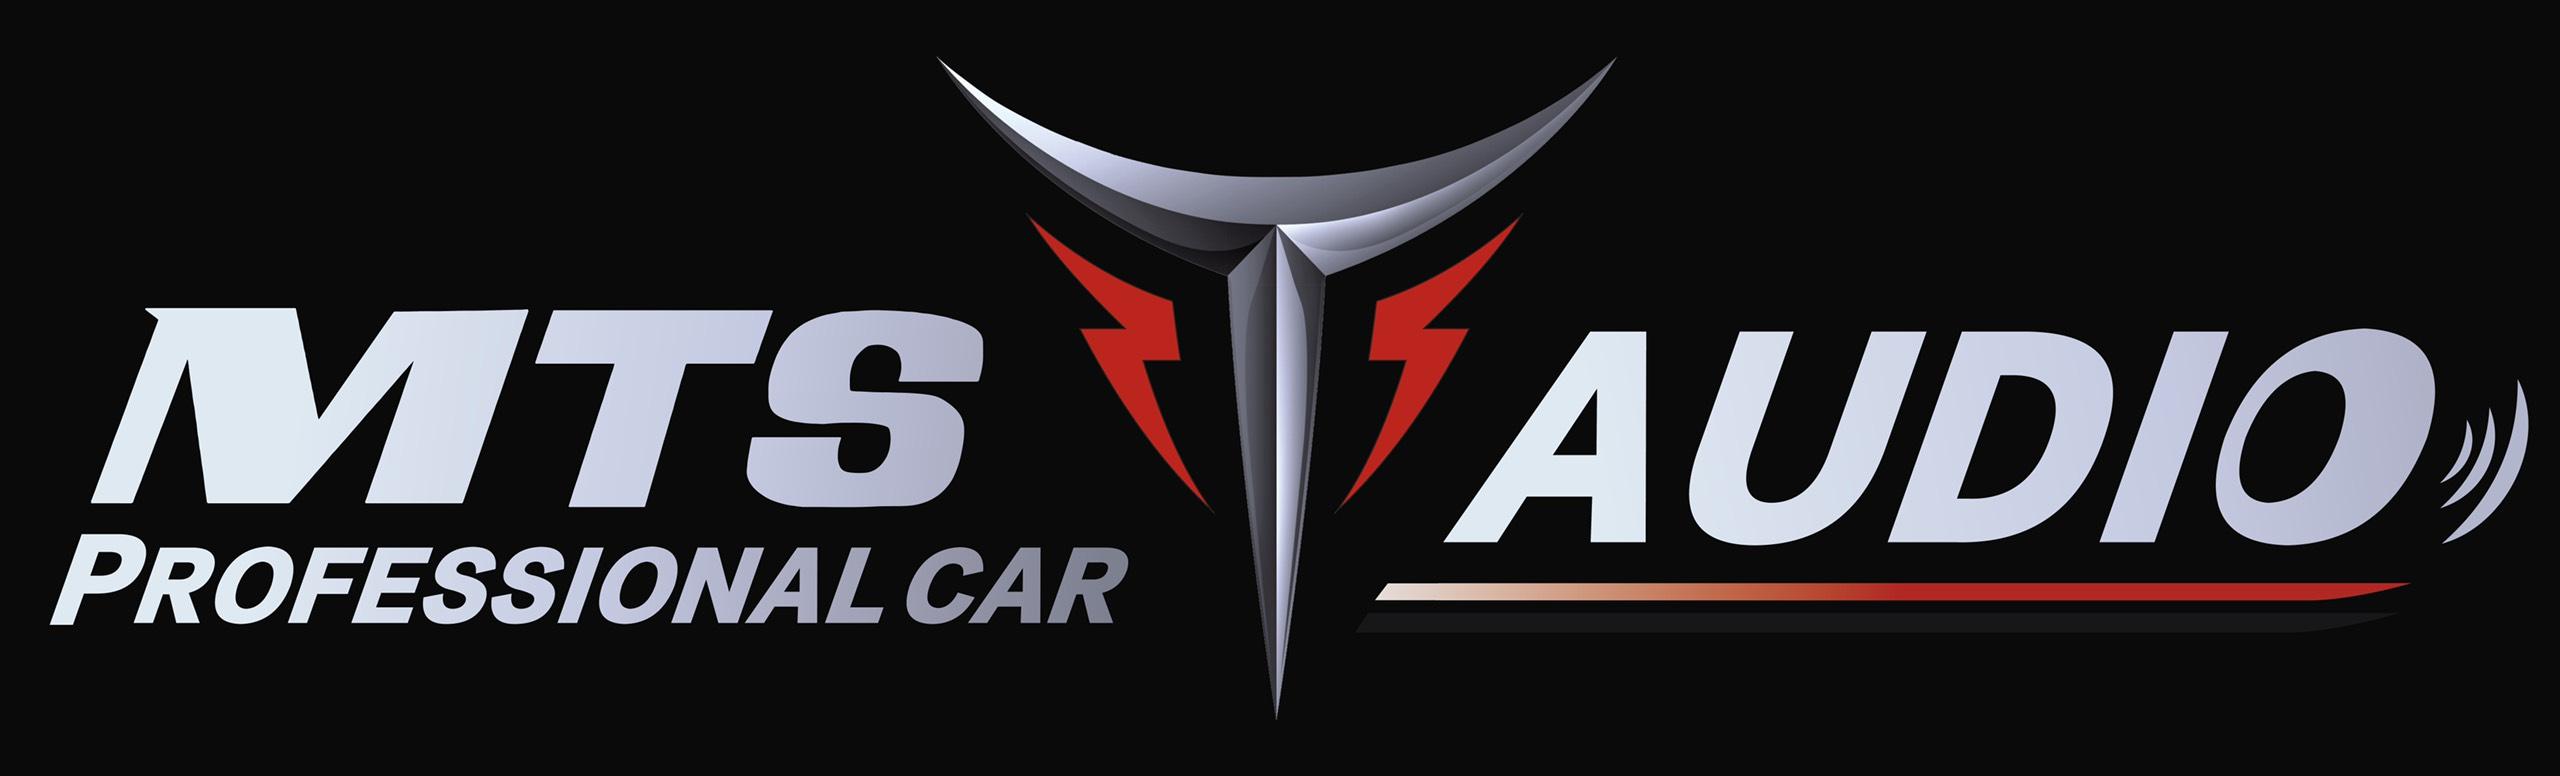 logo-MTS1.jpg